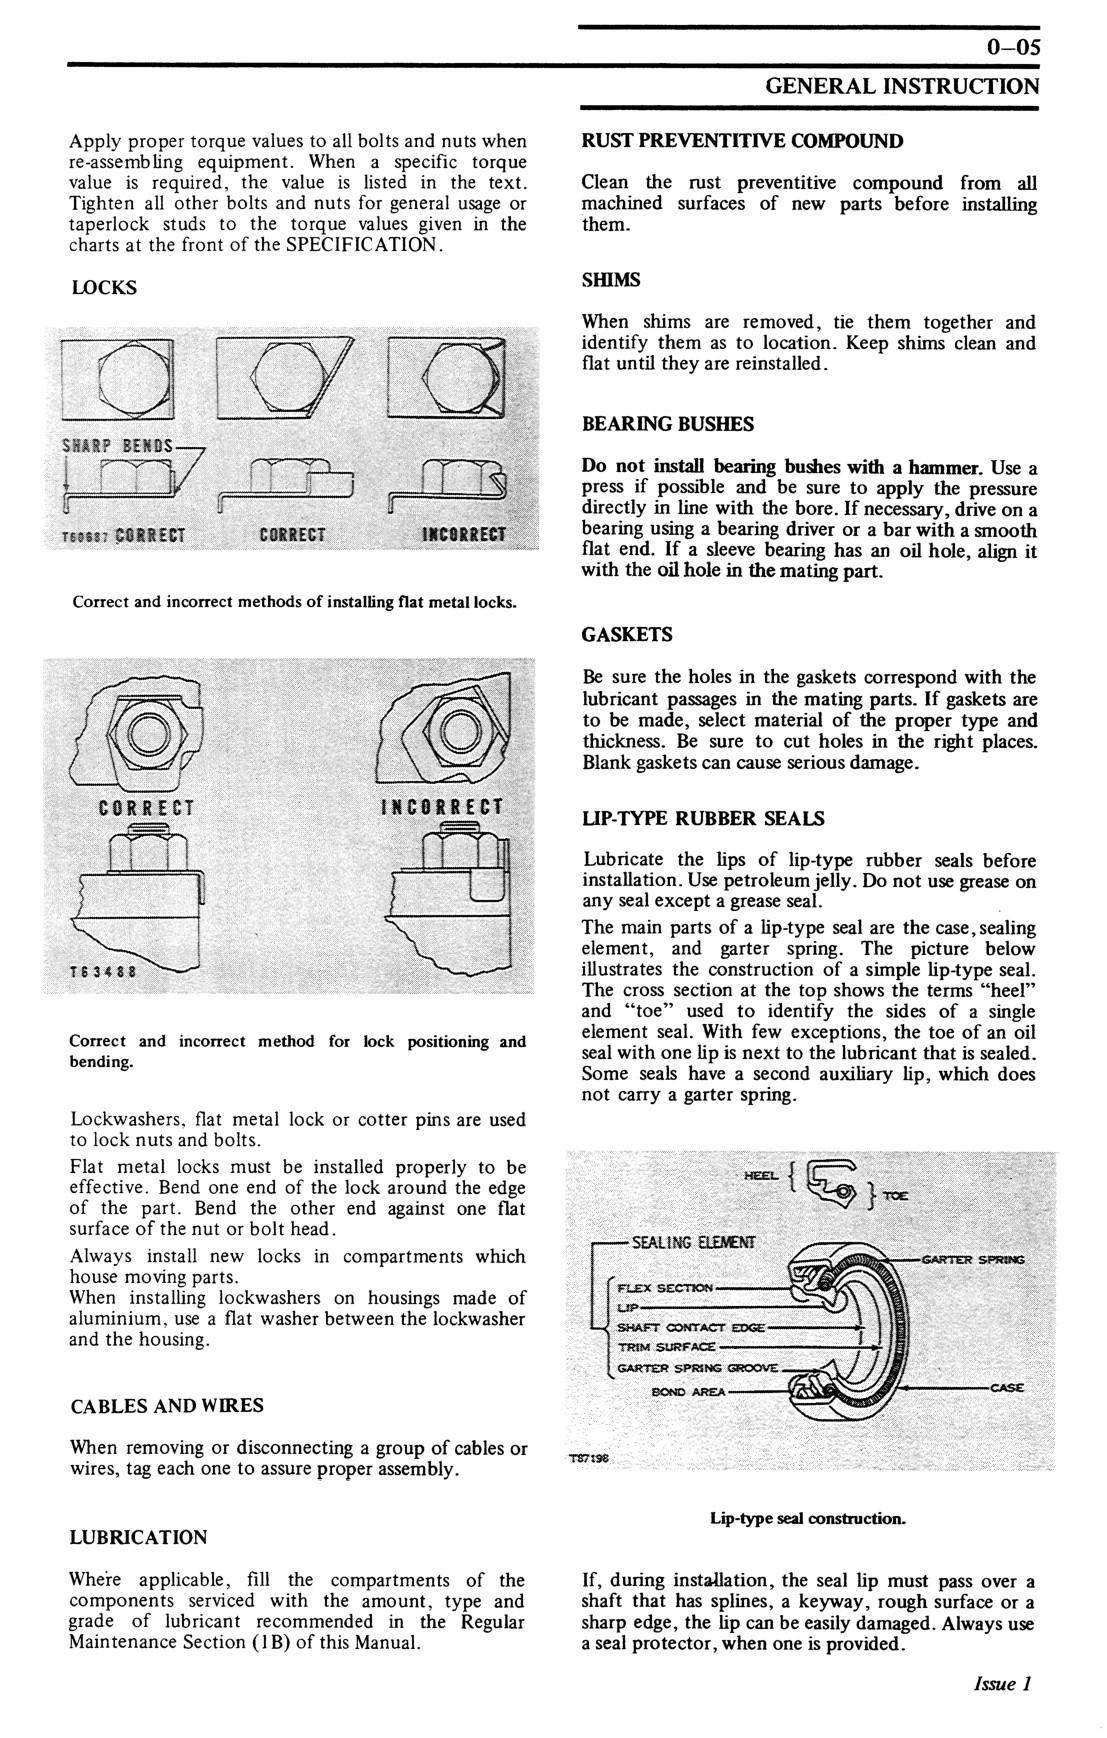 Massey Ferguson 135 148 - service manual